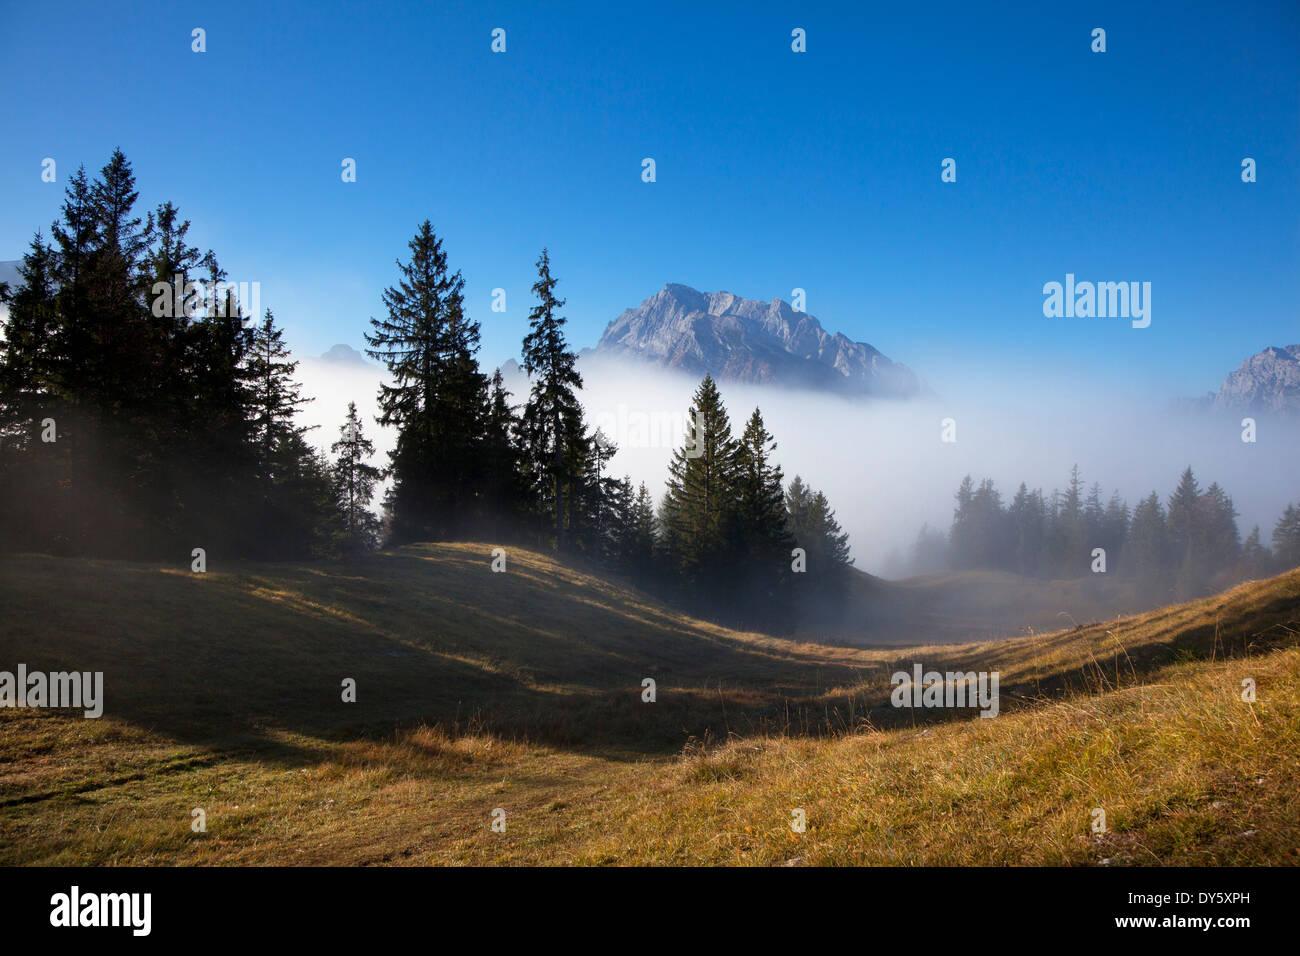 Path in the fog, view onto Hochkalter, Berchtesgaden region, Berchtesgaden National Park, Upper Bavaria, Germany, Europe - Stock Image